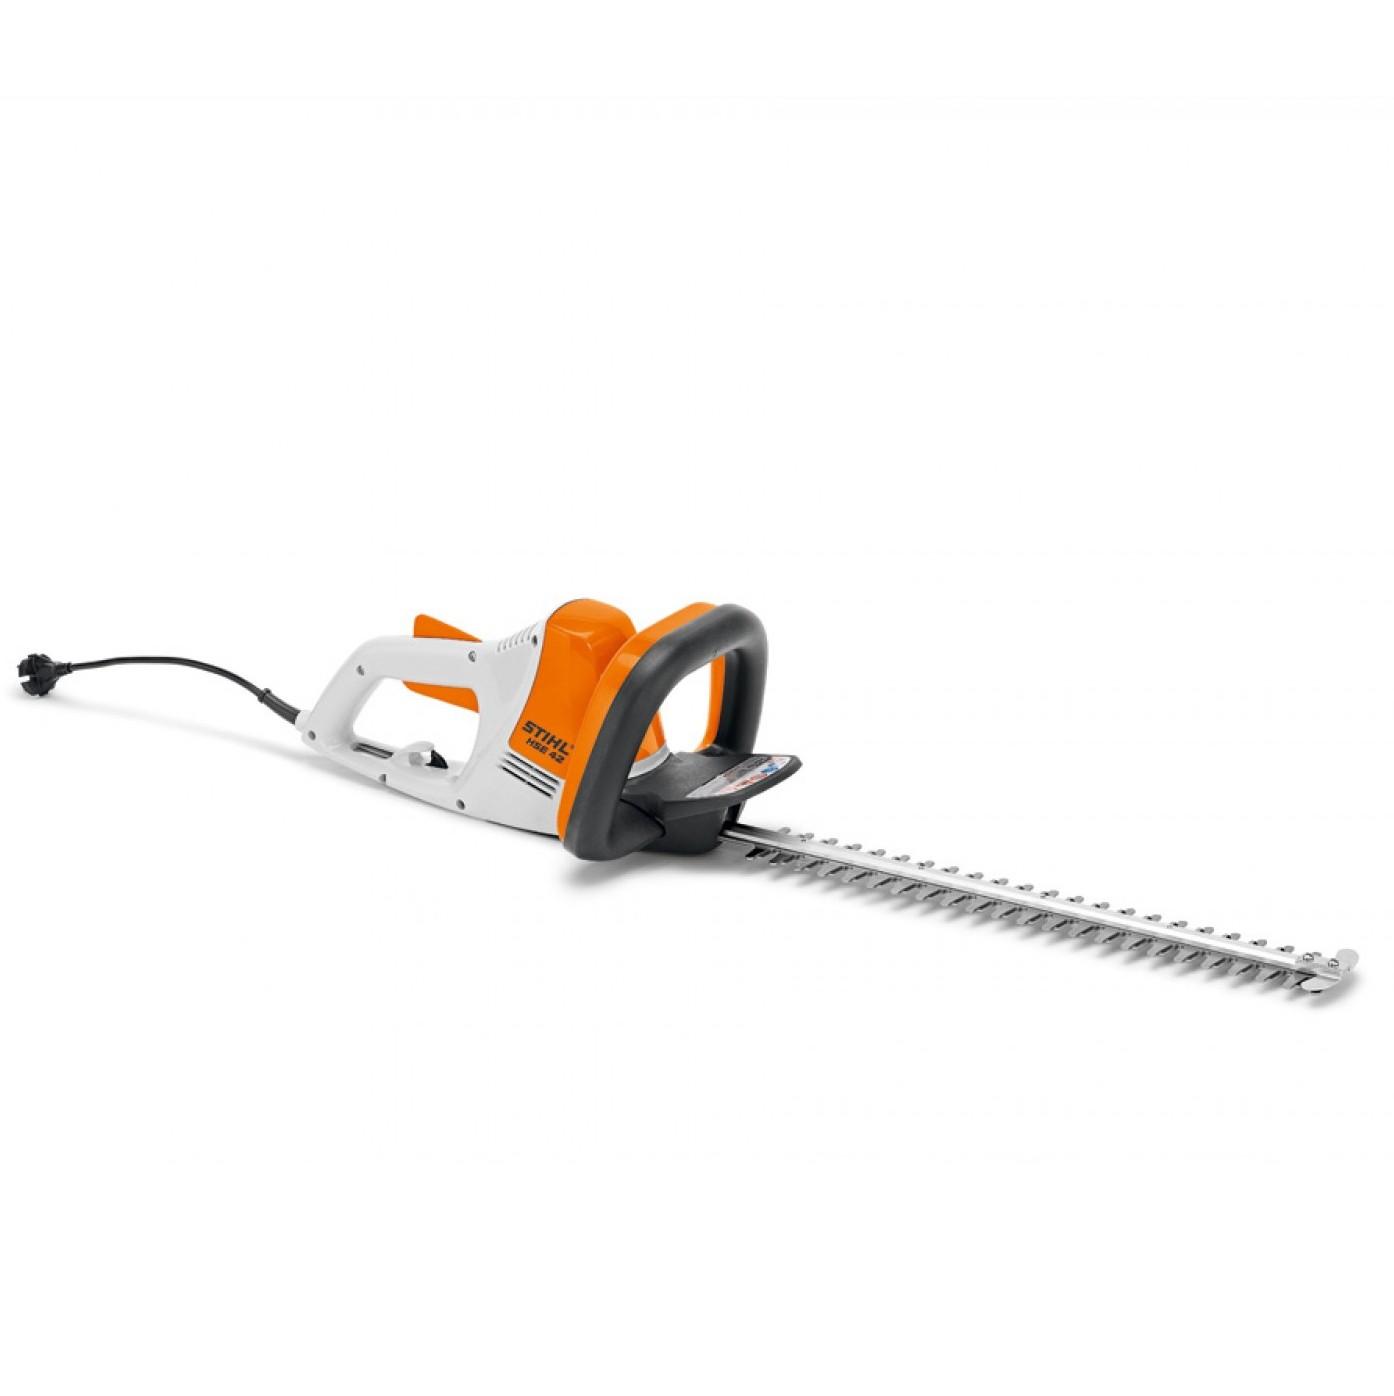 stihl hse 42 electric hedge trimmer australian mower supply. Black Bedroom Furniture Sets. Home Design Ideas